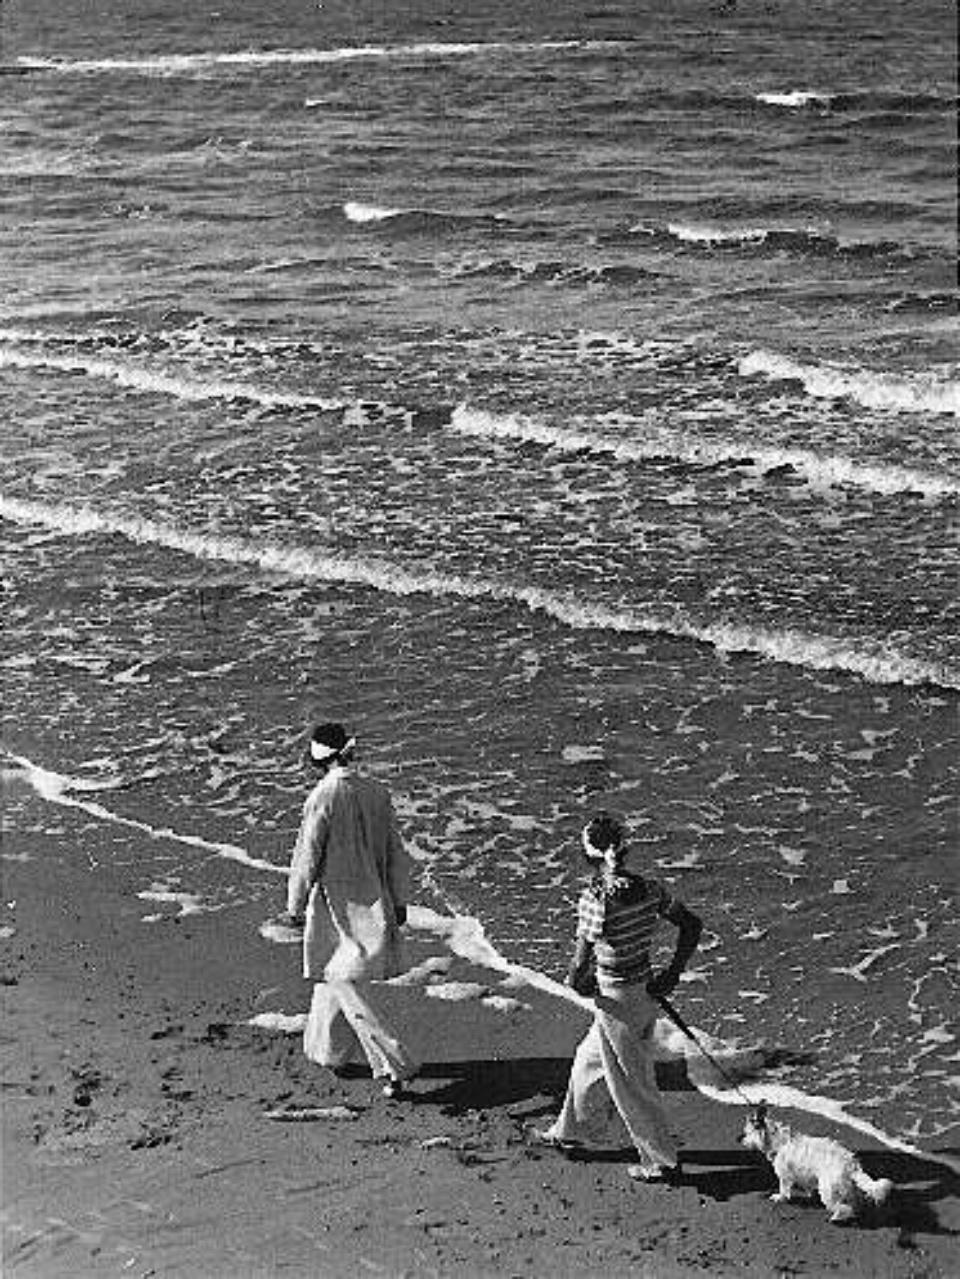 E.O. Hoppé Two women walking on Beach, 1930's Vintage gelatin silver print 14 x 10,5 cm